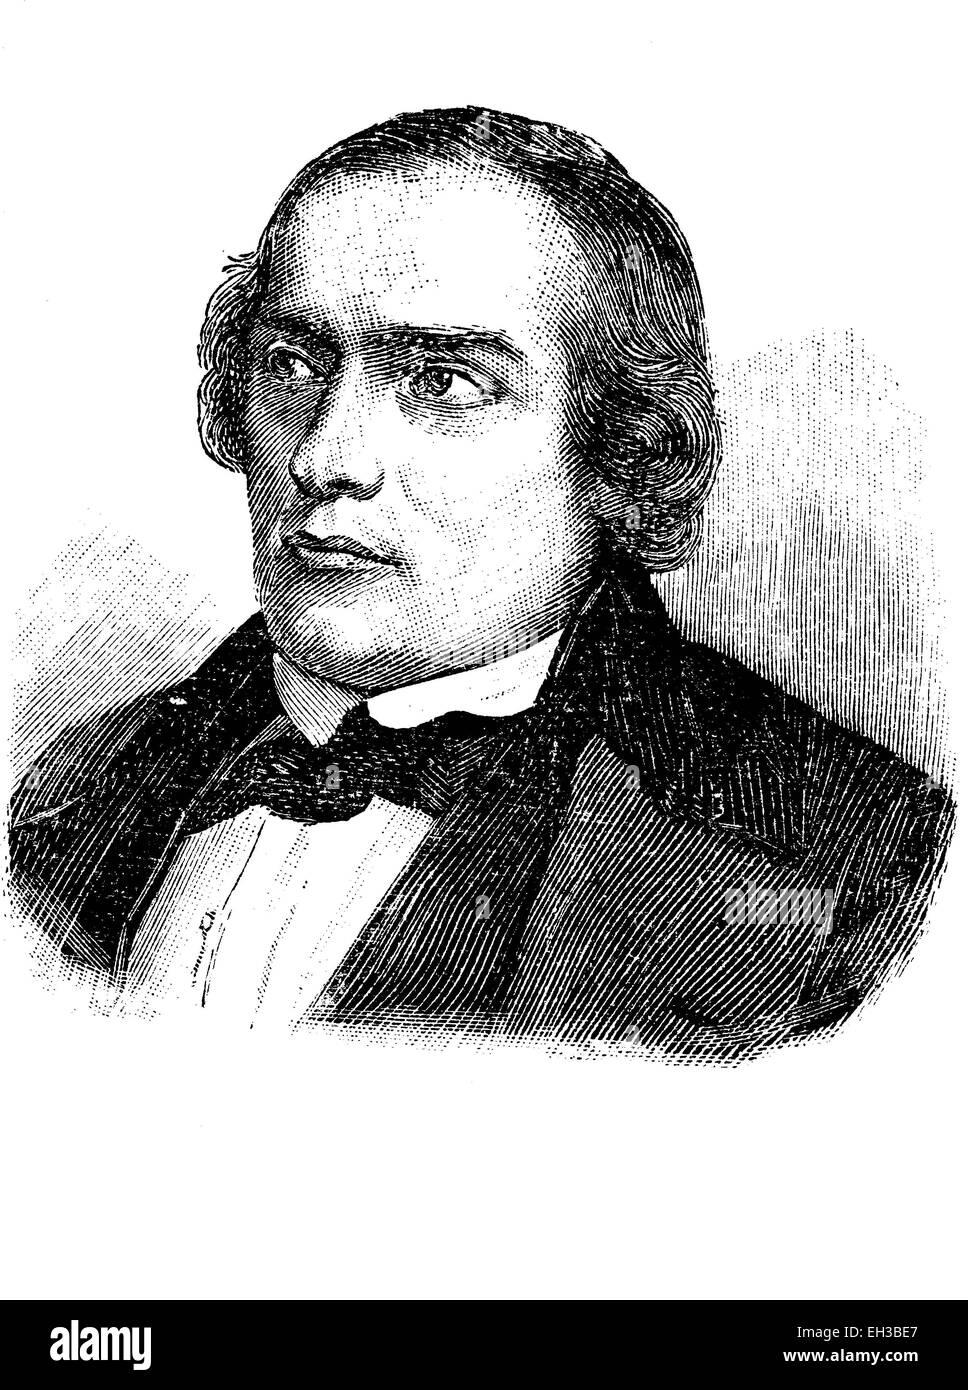 Wilhelm Eberhard Oskar Freiherr von Wydenbrugk, 1815 - 1876, a German liberal politician, Maerz-minister in Saxe - Stock Image